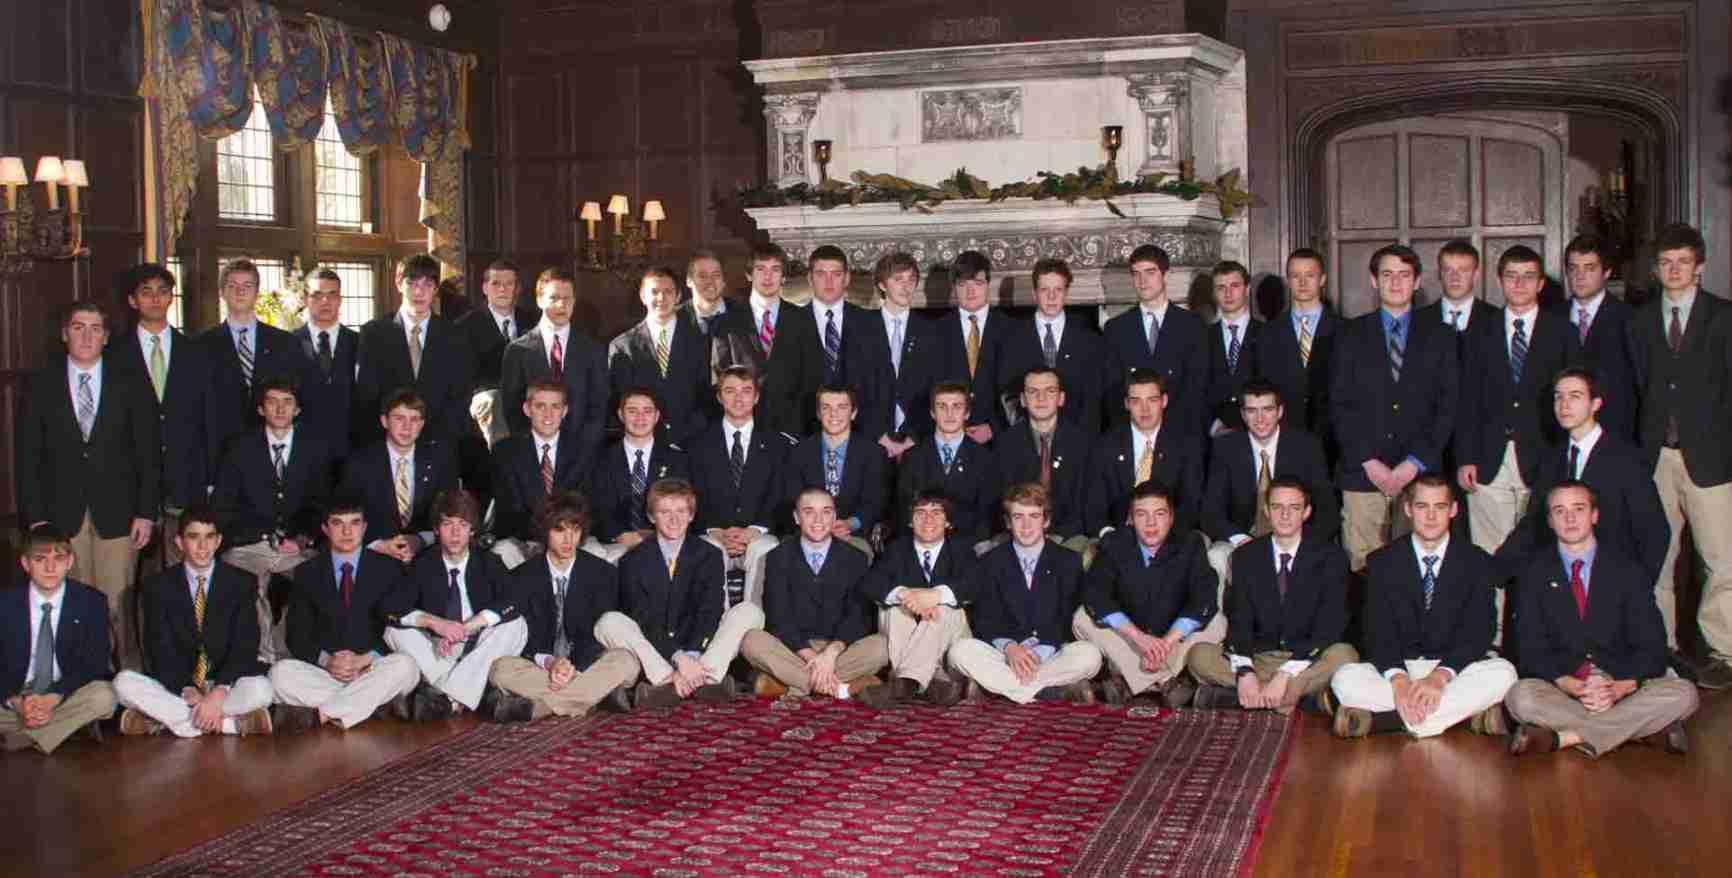 Devon Prep Class of 2012.